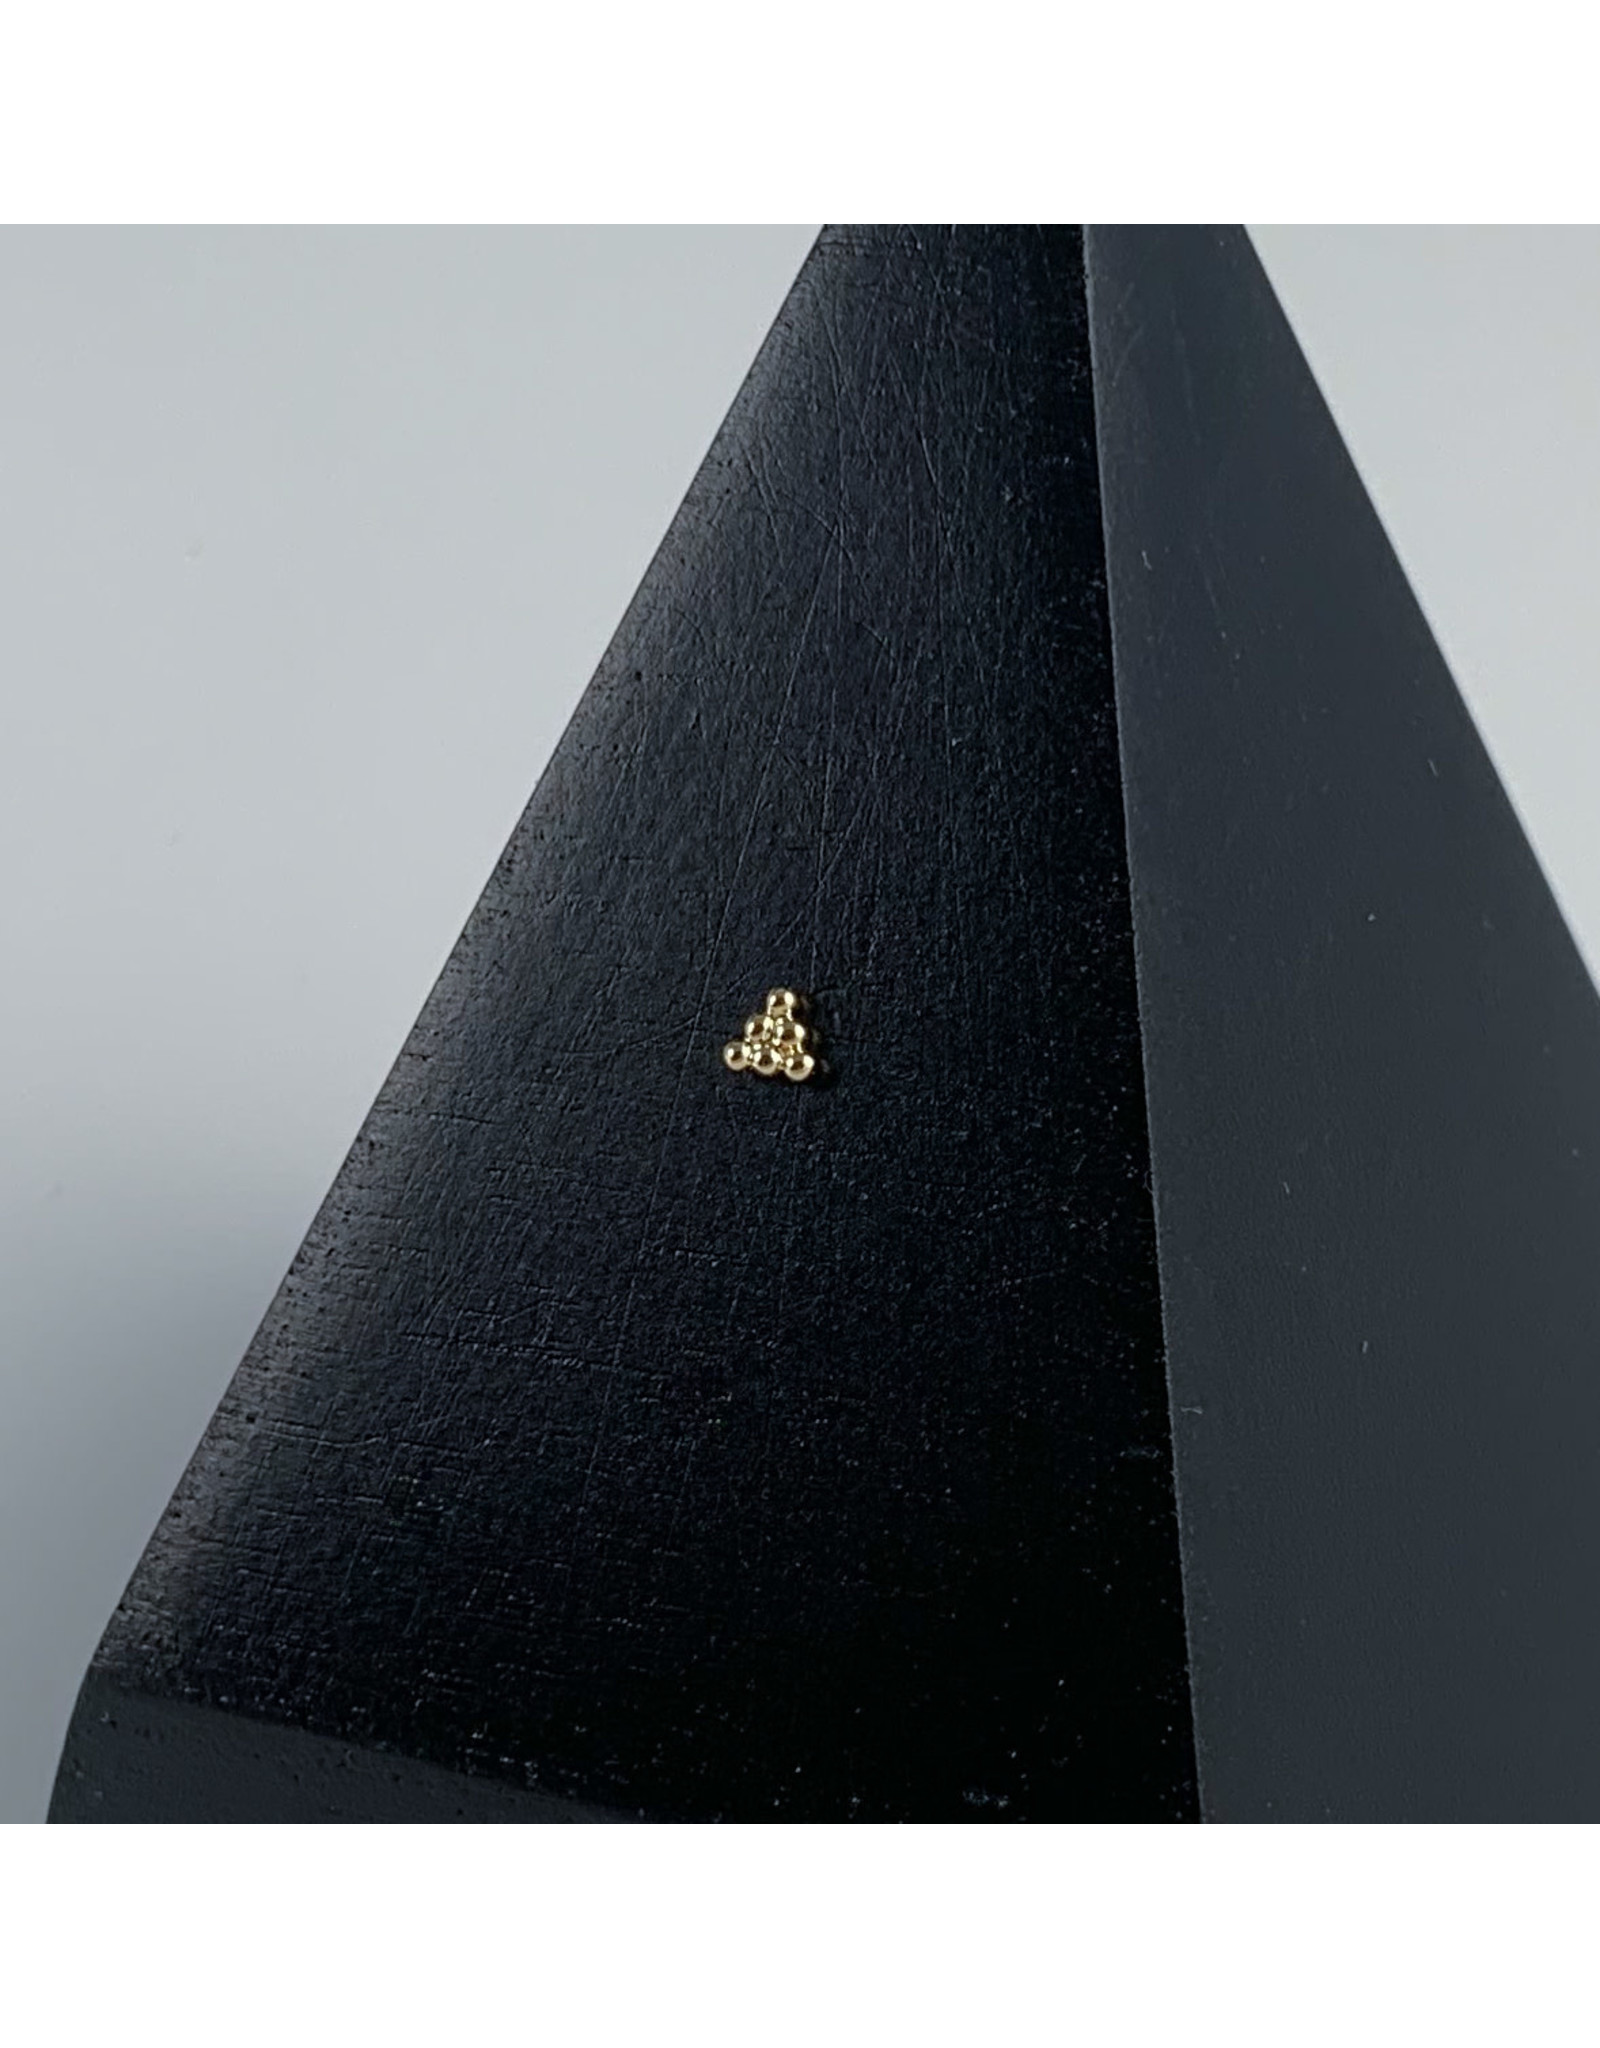 BVLA BVLA 6 bead triangle press-fit end